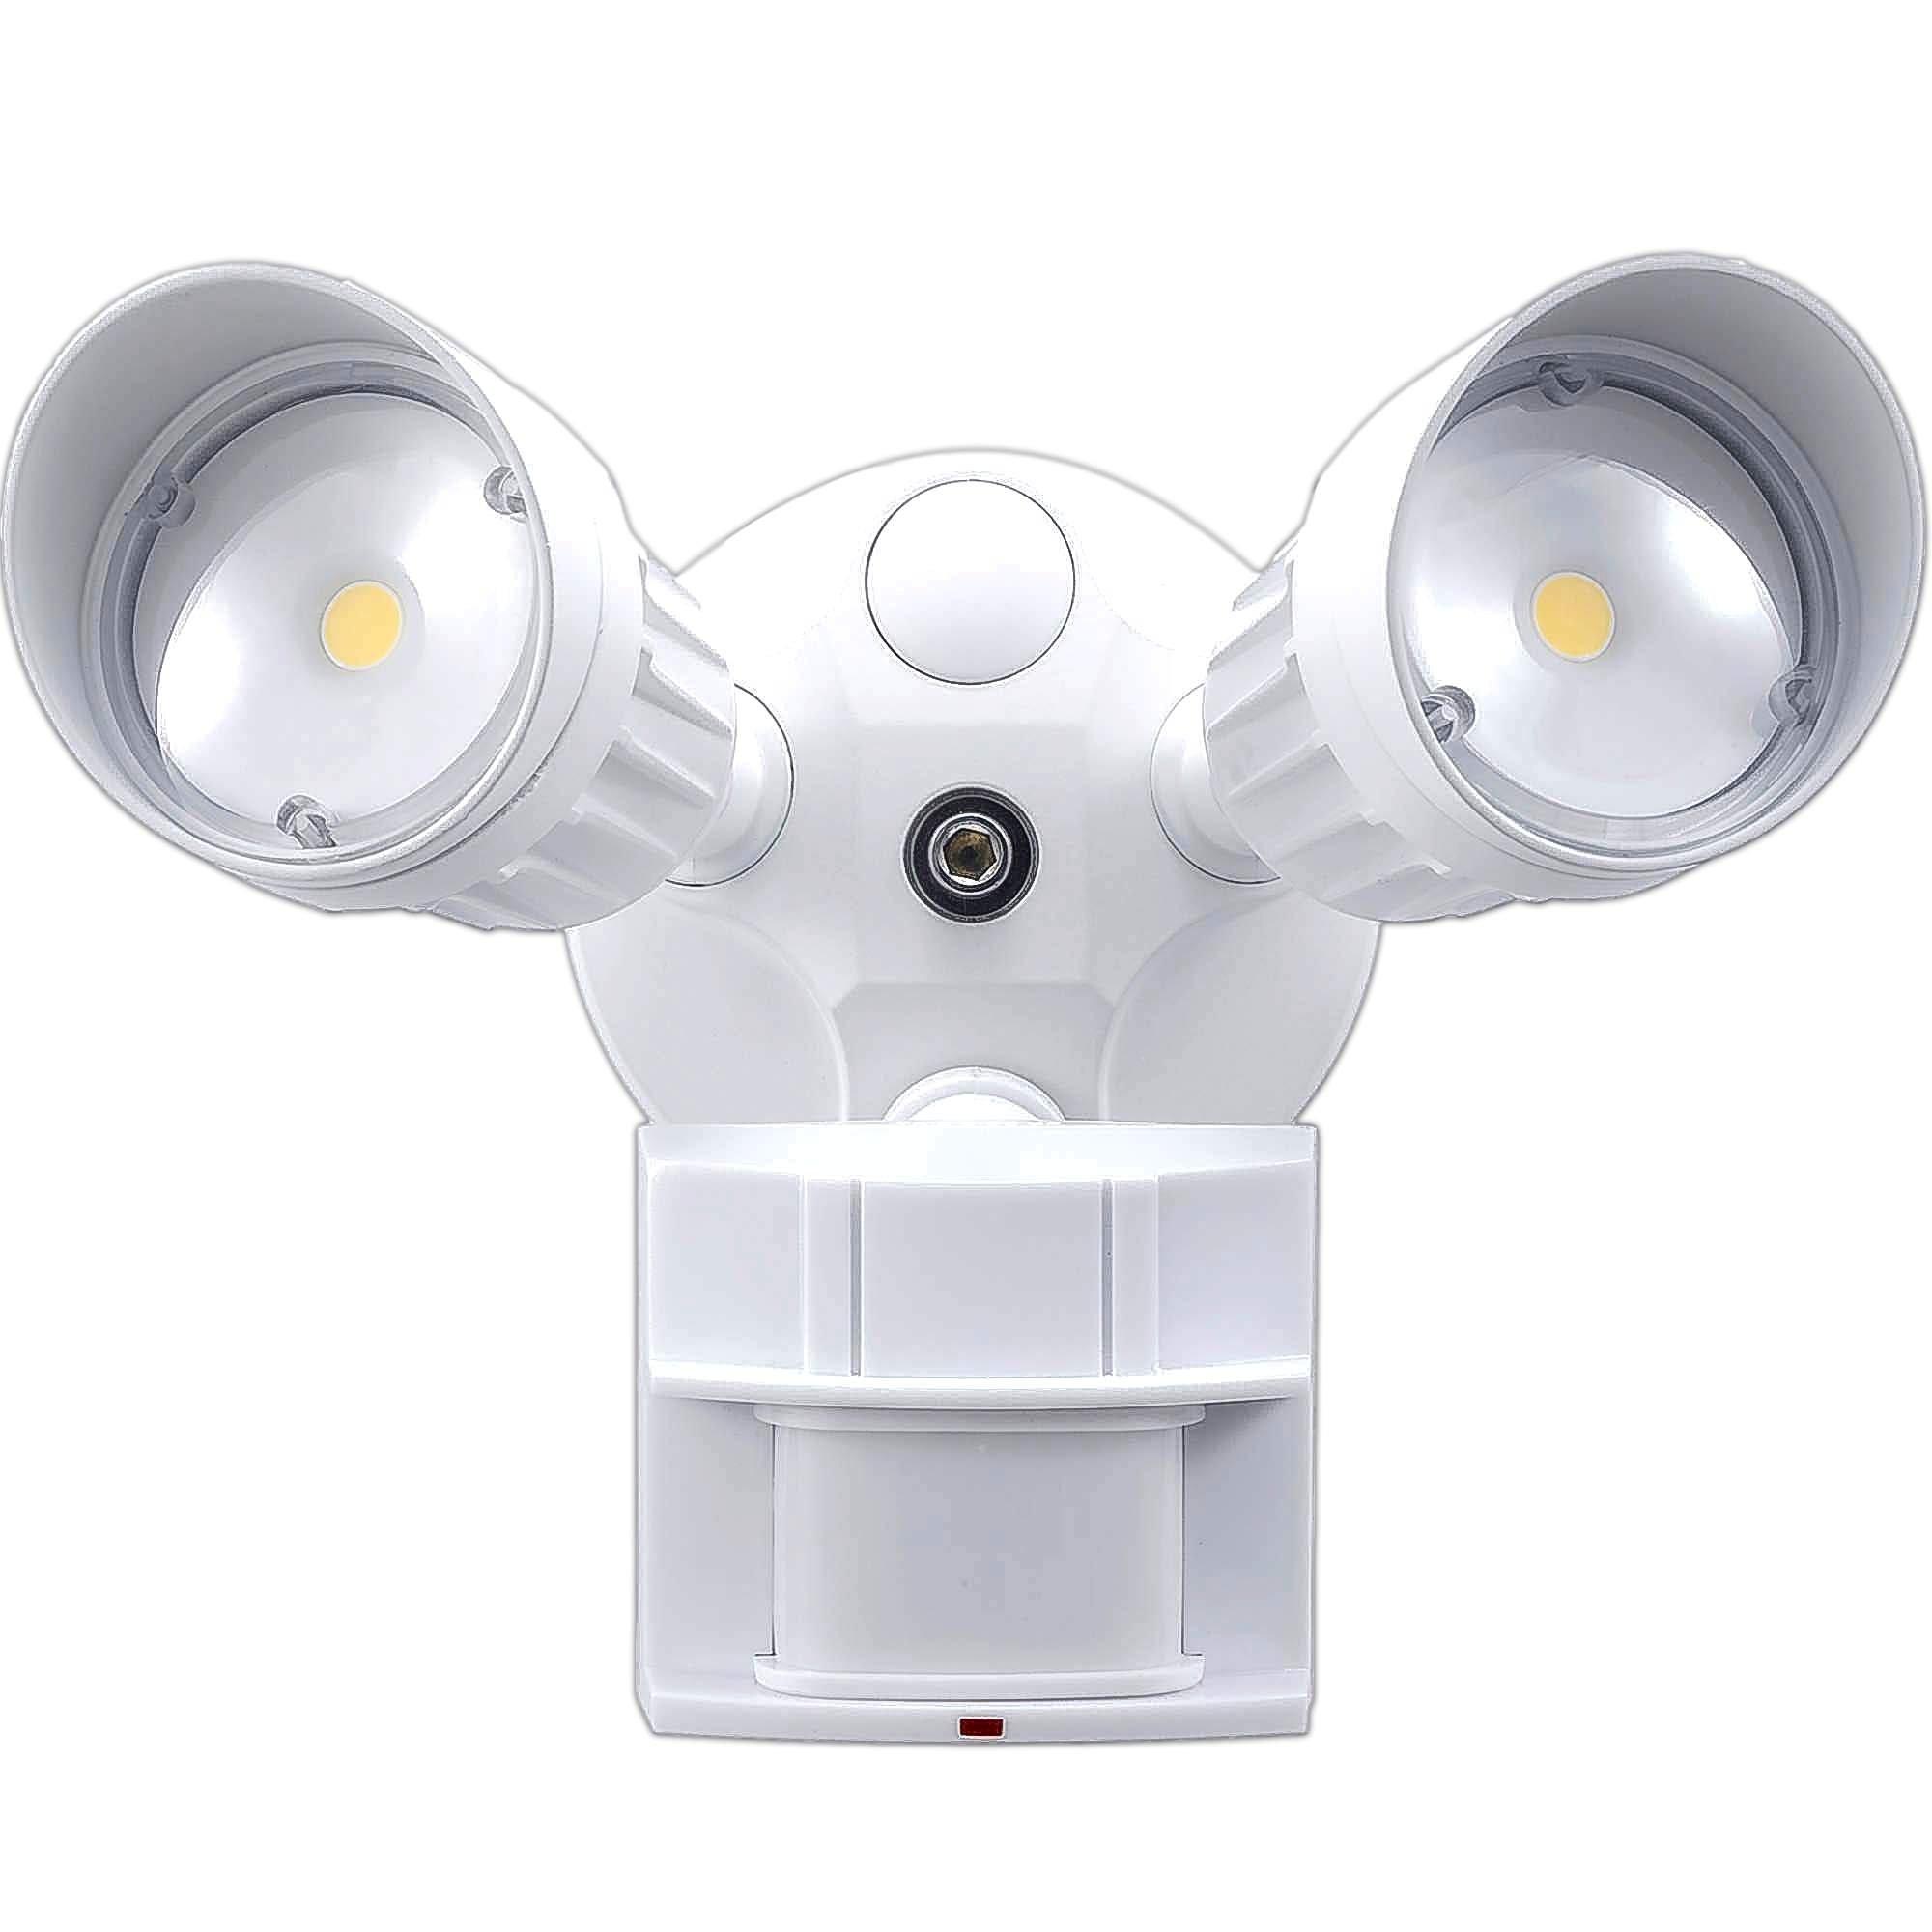 2 Pack LED Security Light 20W Flood, Motion Sensor + Photocell, 1750 lm, 5000K (Daylight), Adjustable Head, White, IP65, DLC and ETL Listed